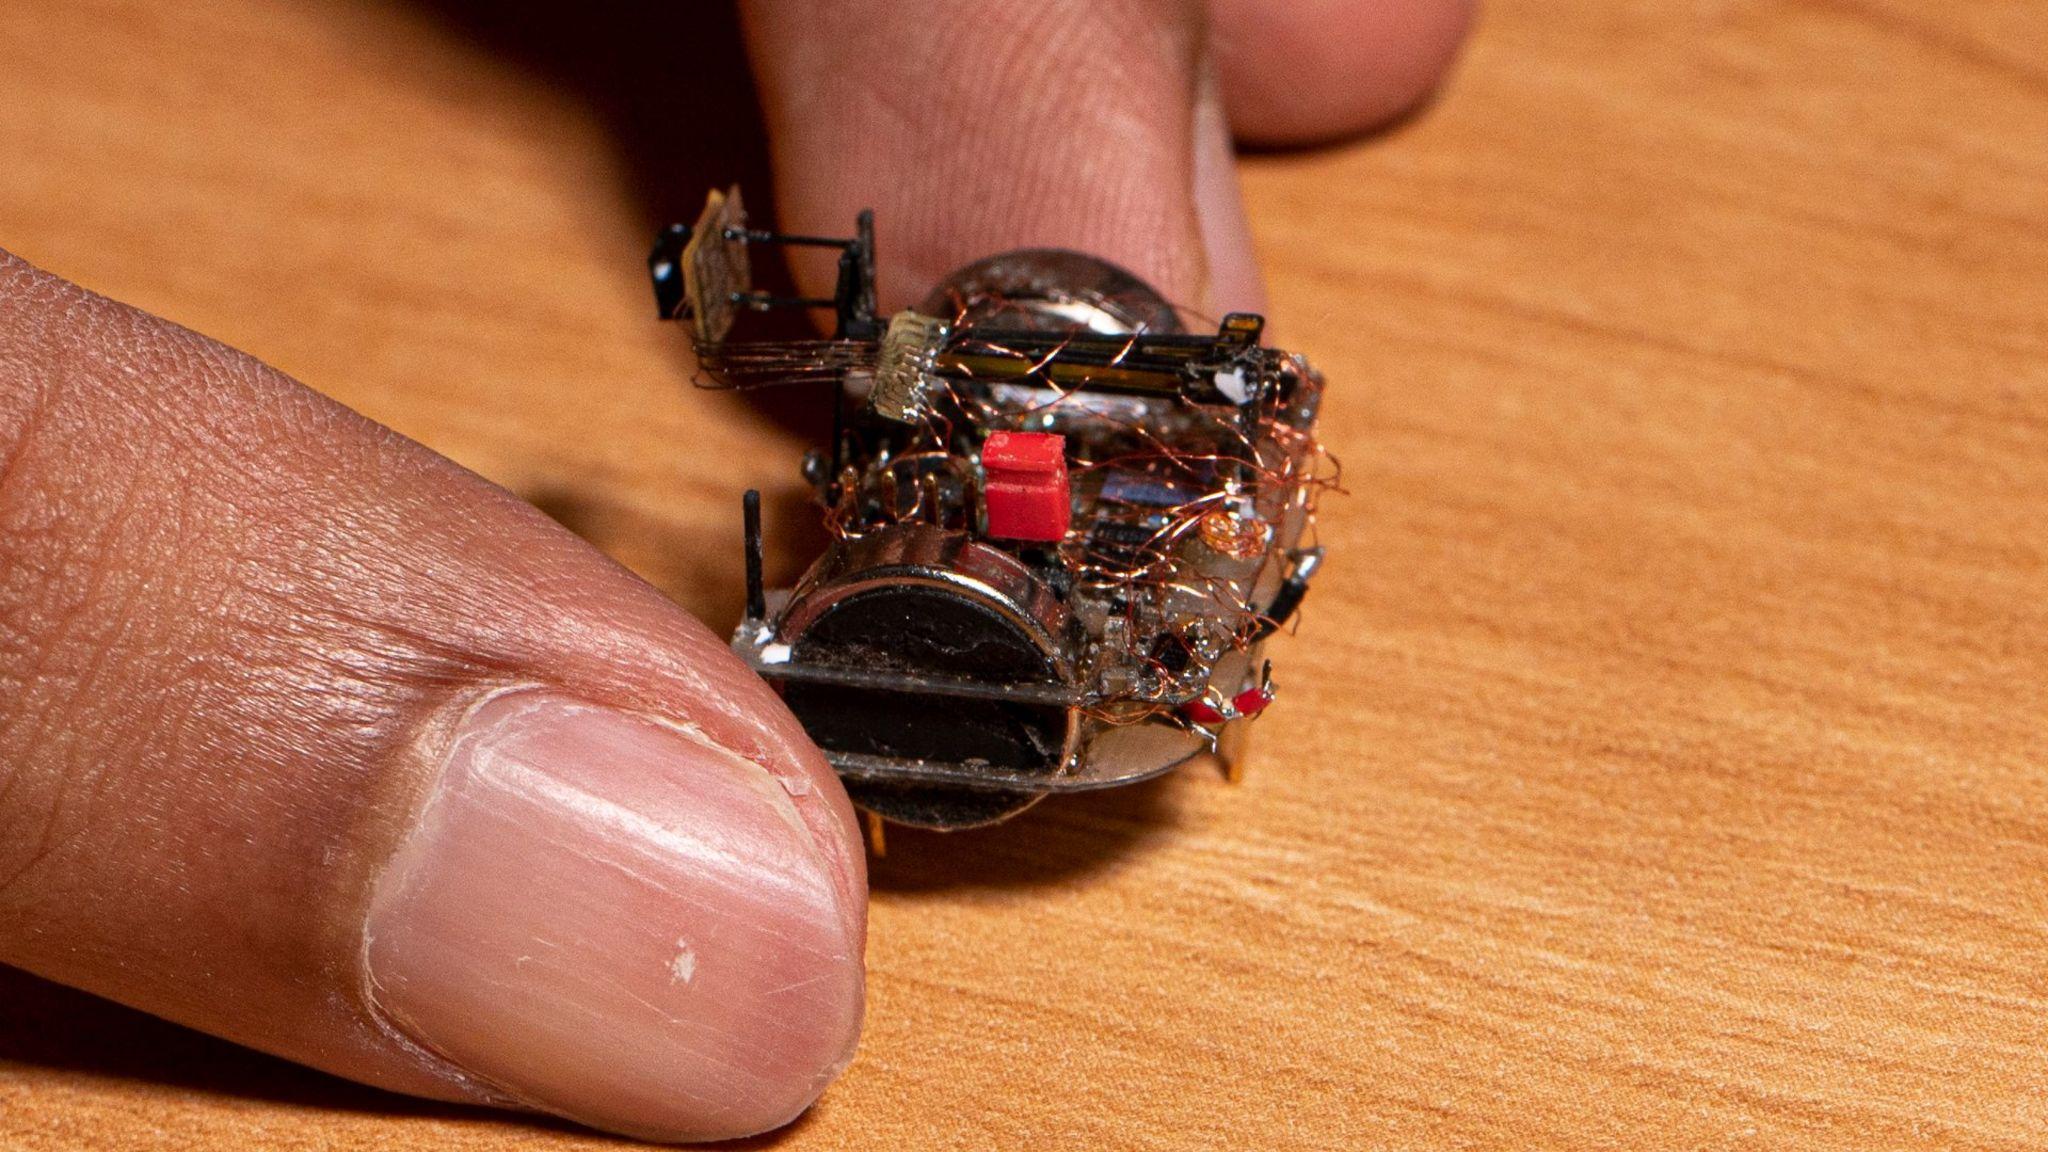 A tiny camera robot